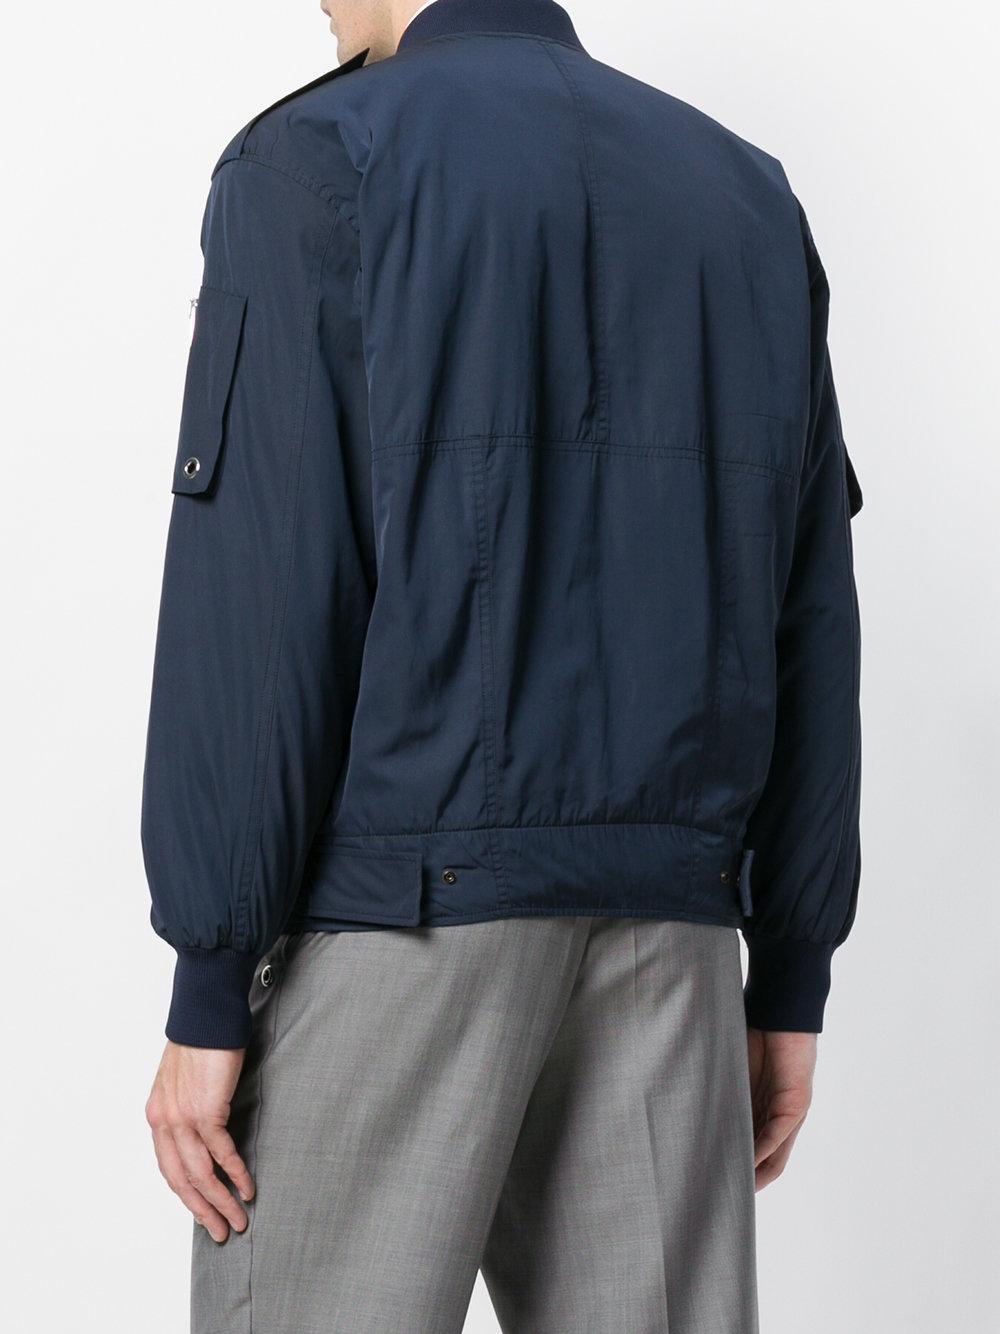 Etudes Studio Cotton Radio Bomber Jacket in Blue for Men